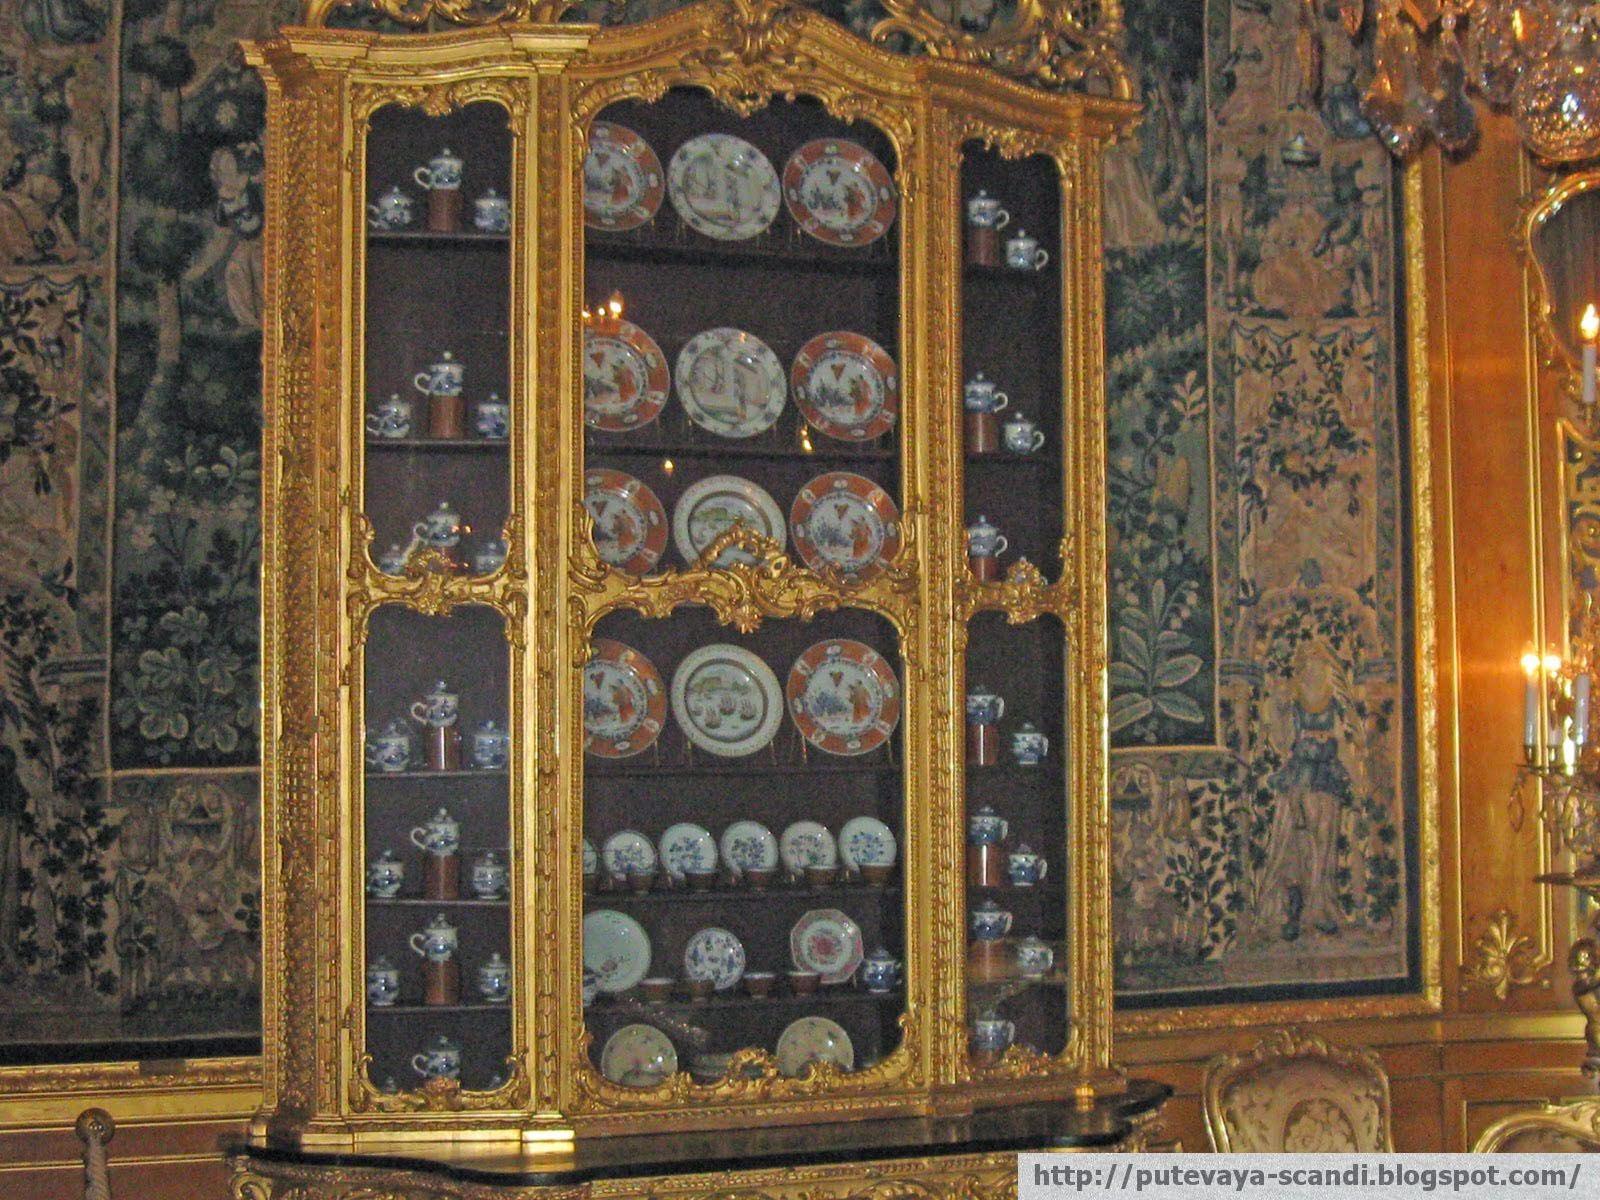 An elegant dresser